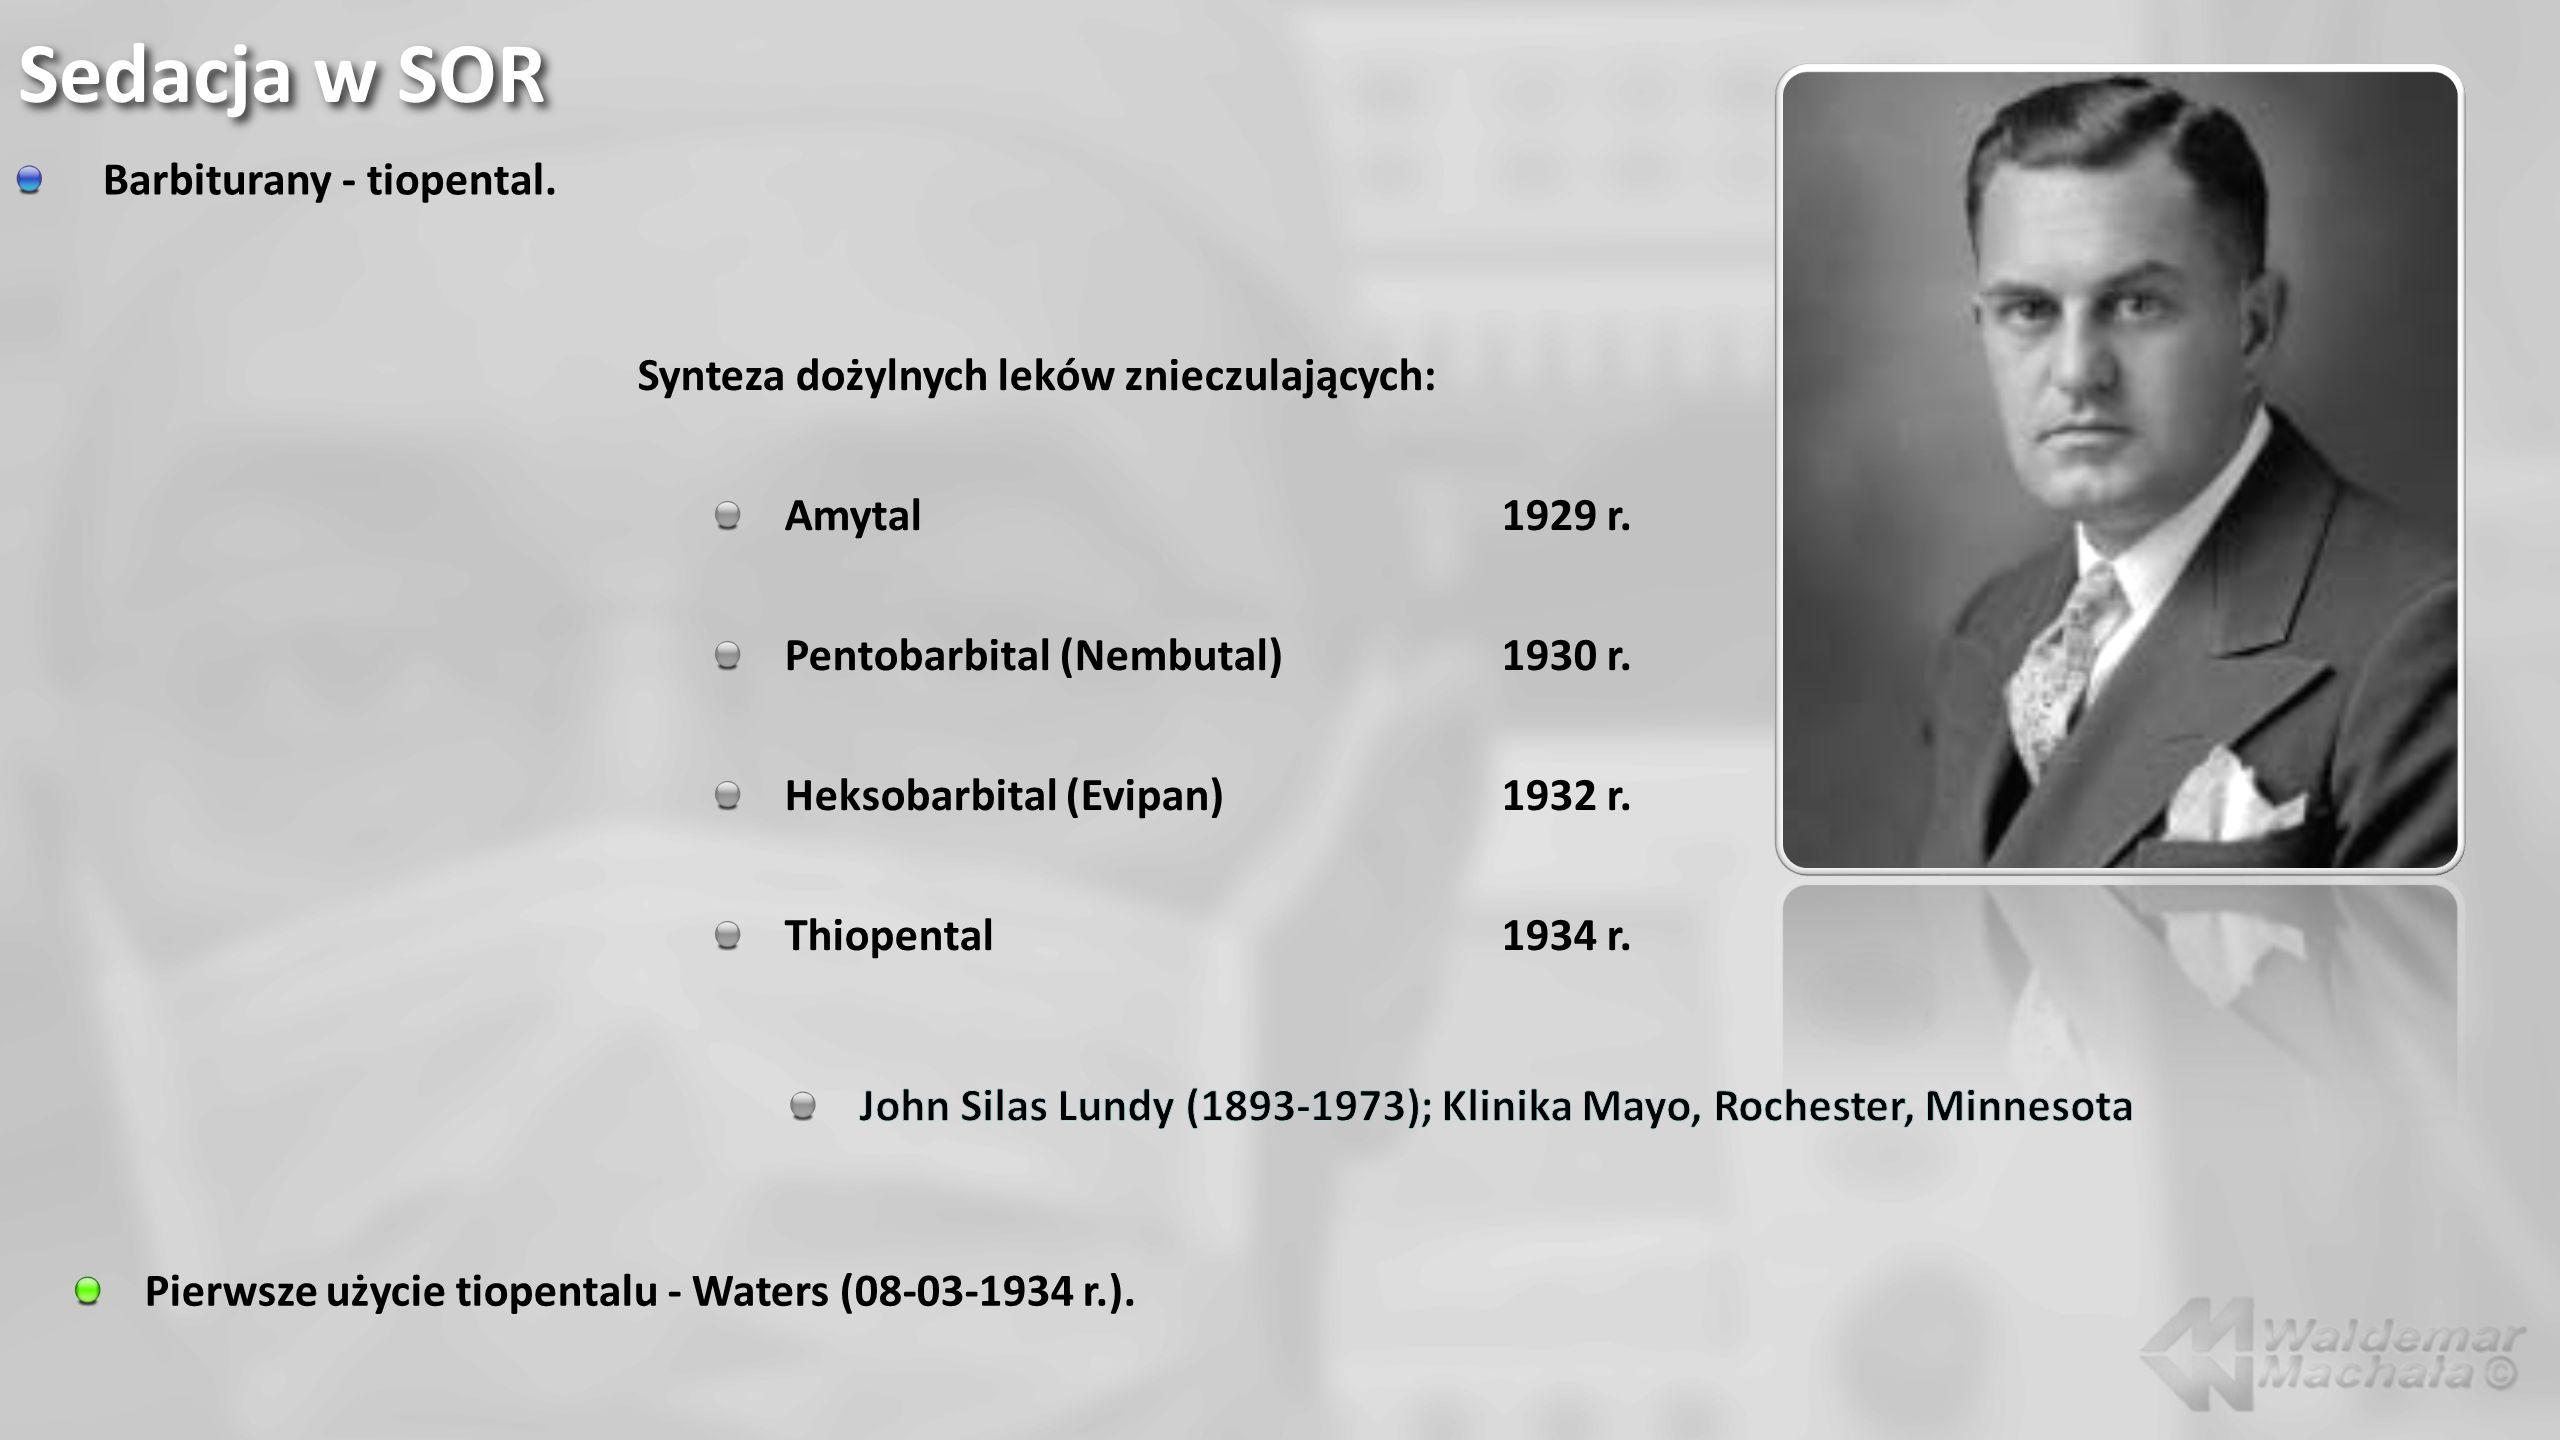 John Silas Lundy (1893-1973); Klinika Mayo, Rochester, Minnesota